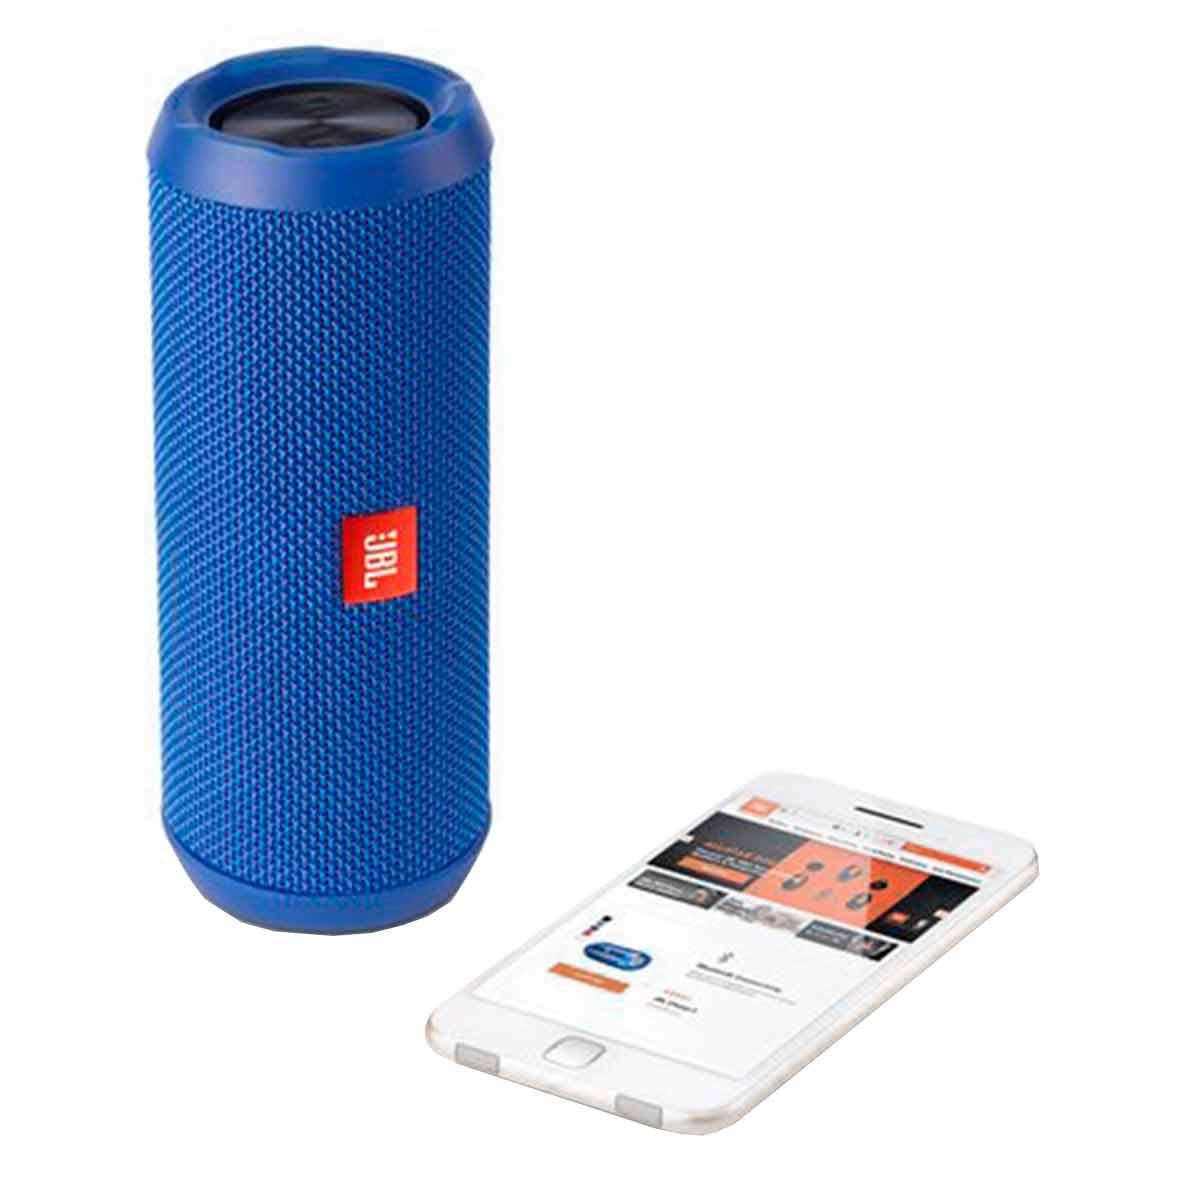 JBLFLIP3 - Caixa de Som Portátil 16W c/ Bluetooth JBL FLIP3 Azul - JBL